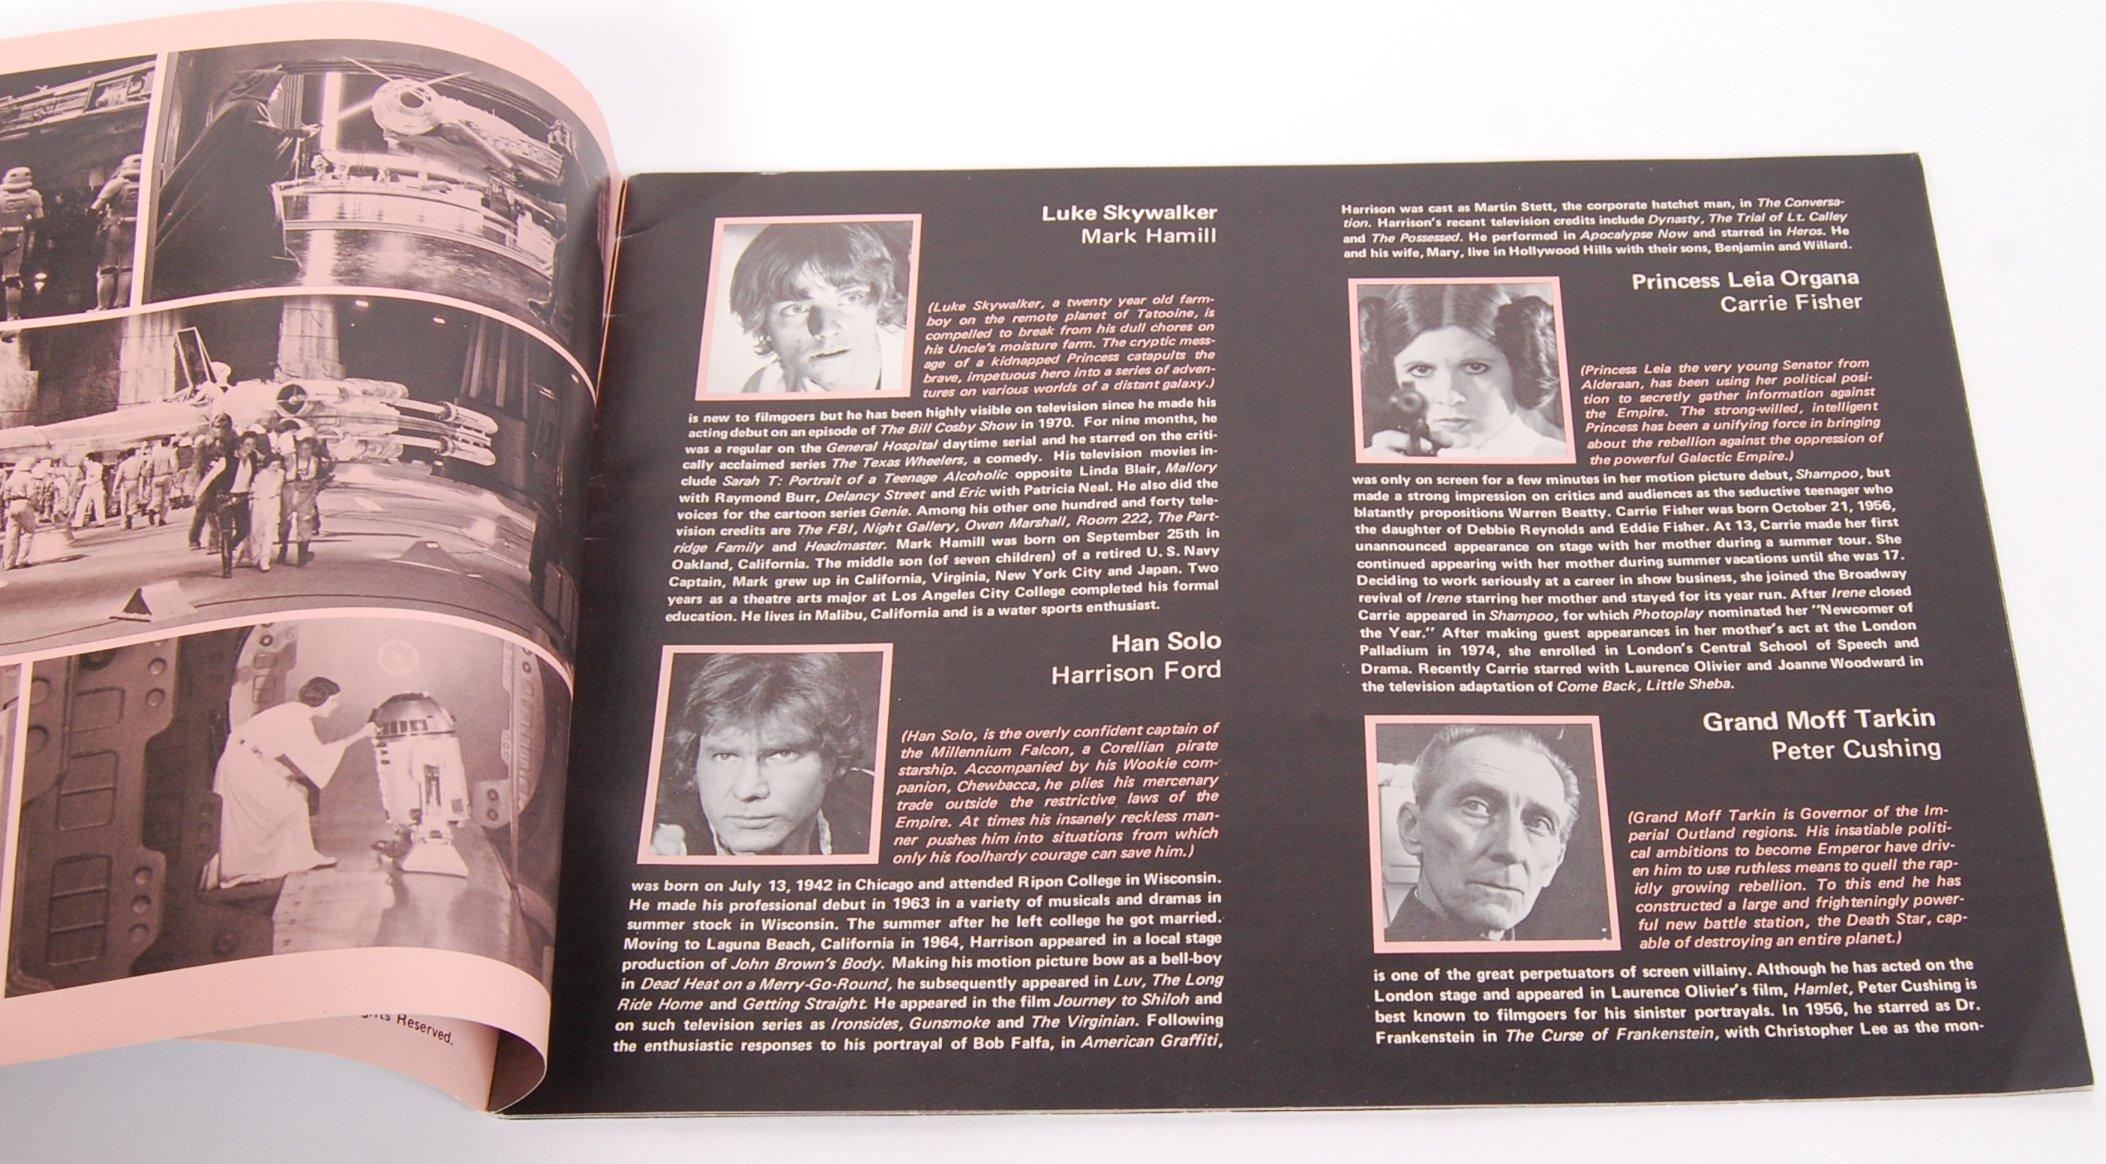 RARE ORIGINAL 1977 STAR WARS UK CINEMA RELEASE BRO - Image 3 of 4